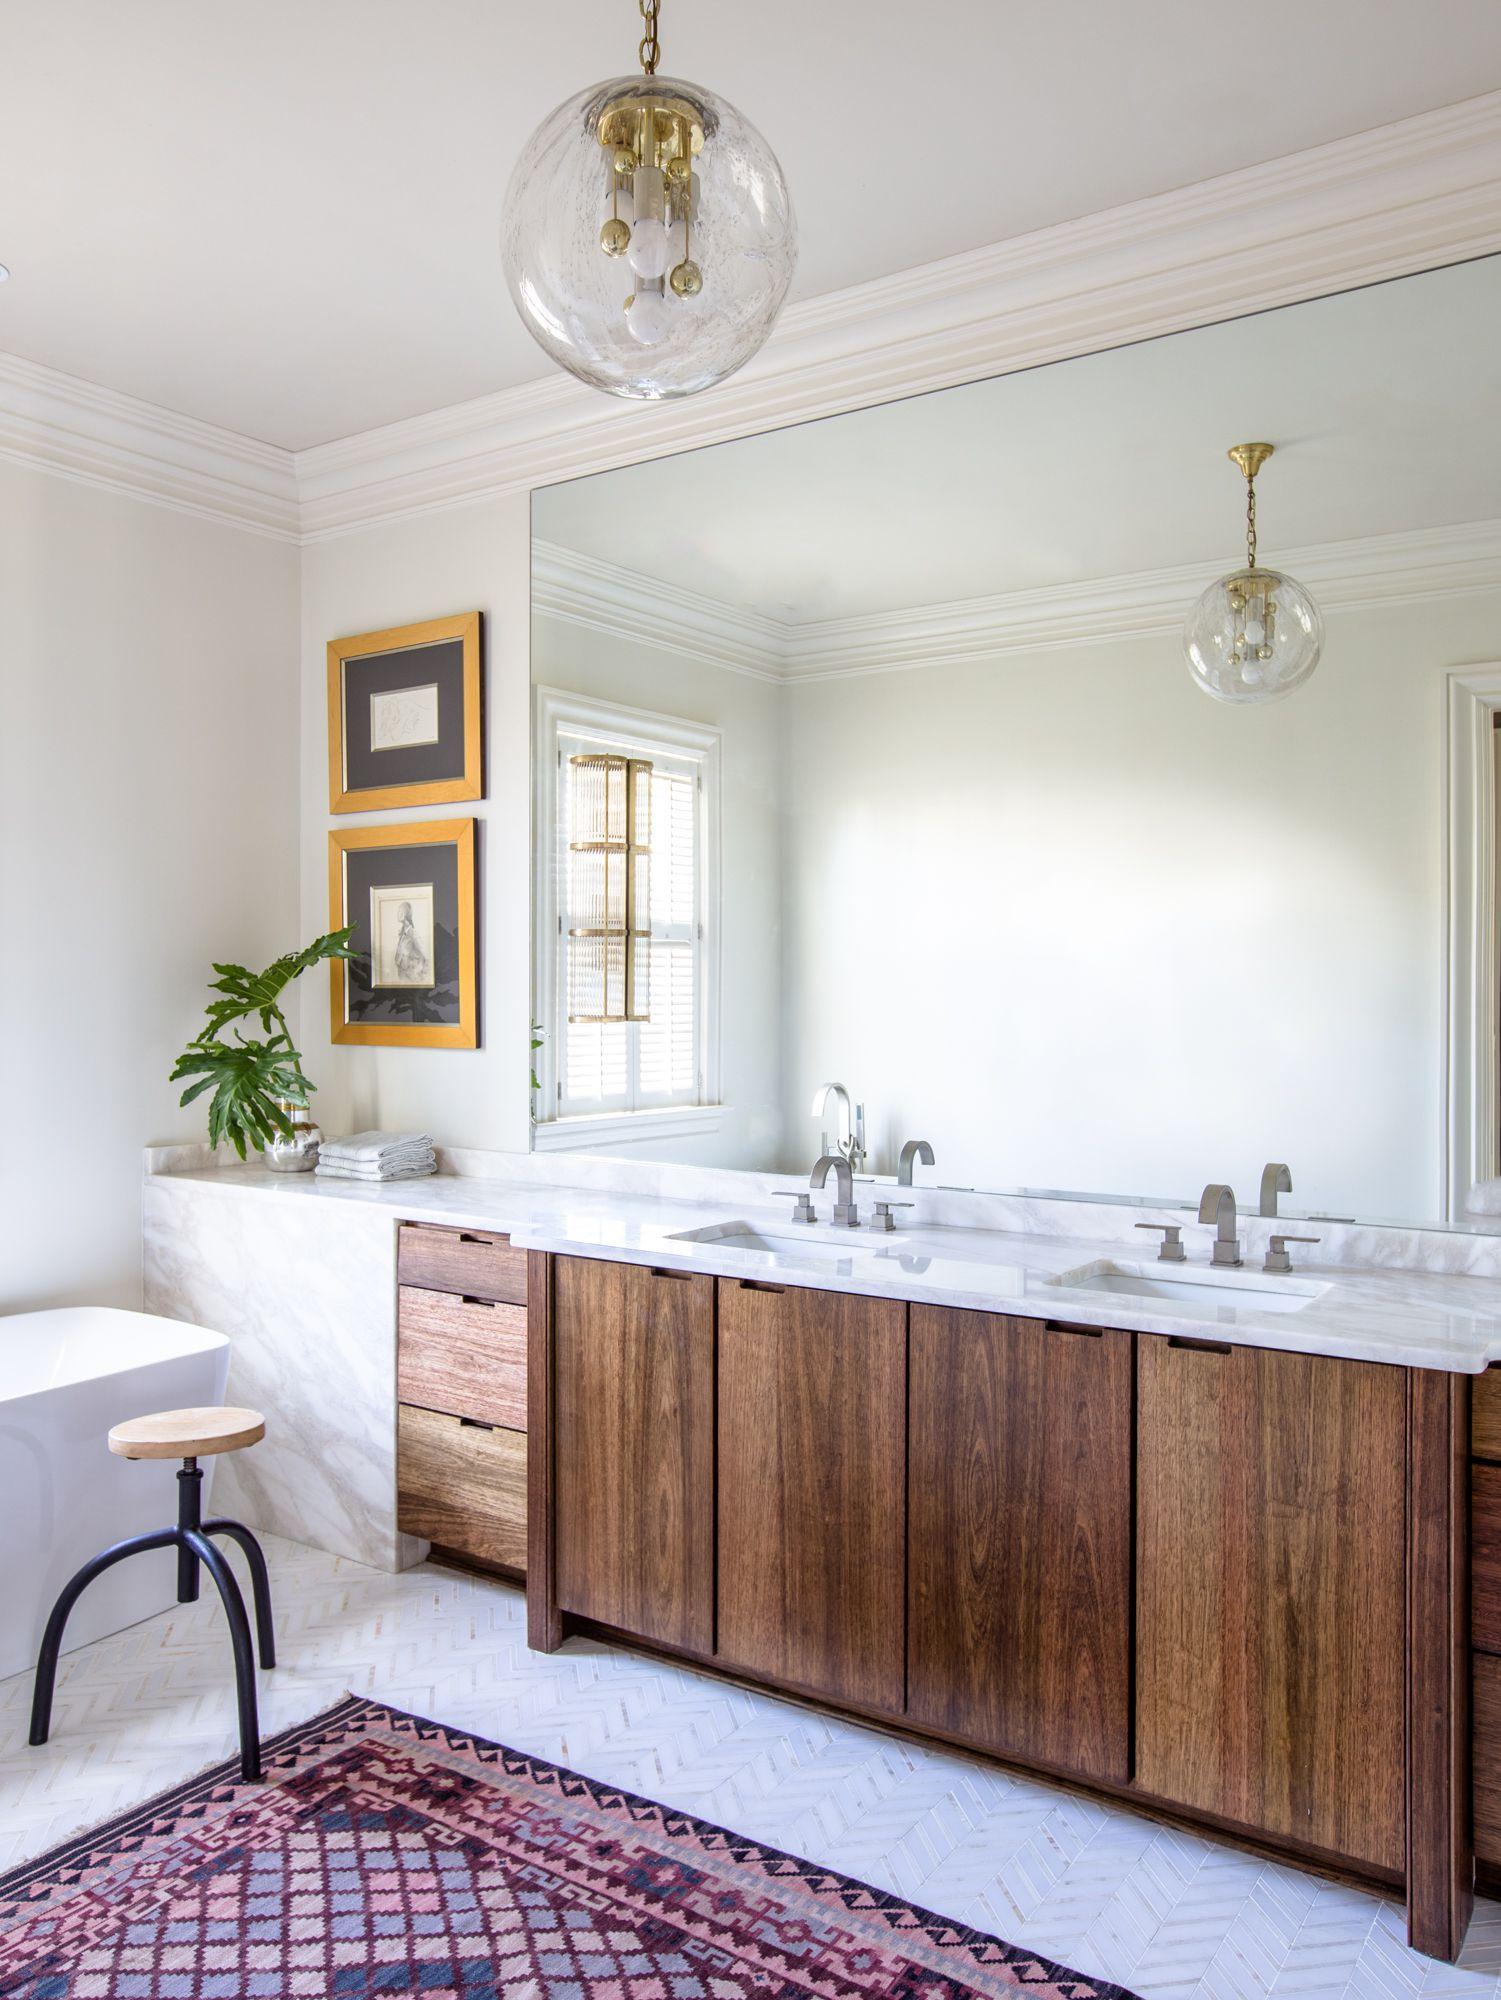 20 decoration ideas for the lido - bathroom with beach motifs LXBHNUR